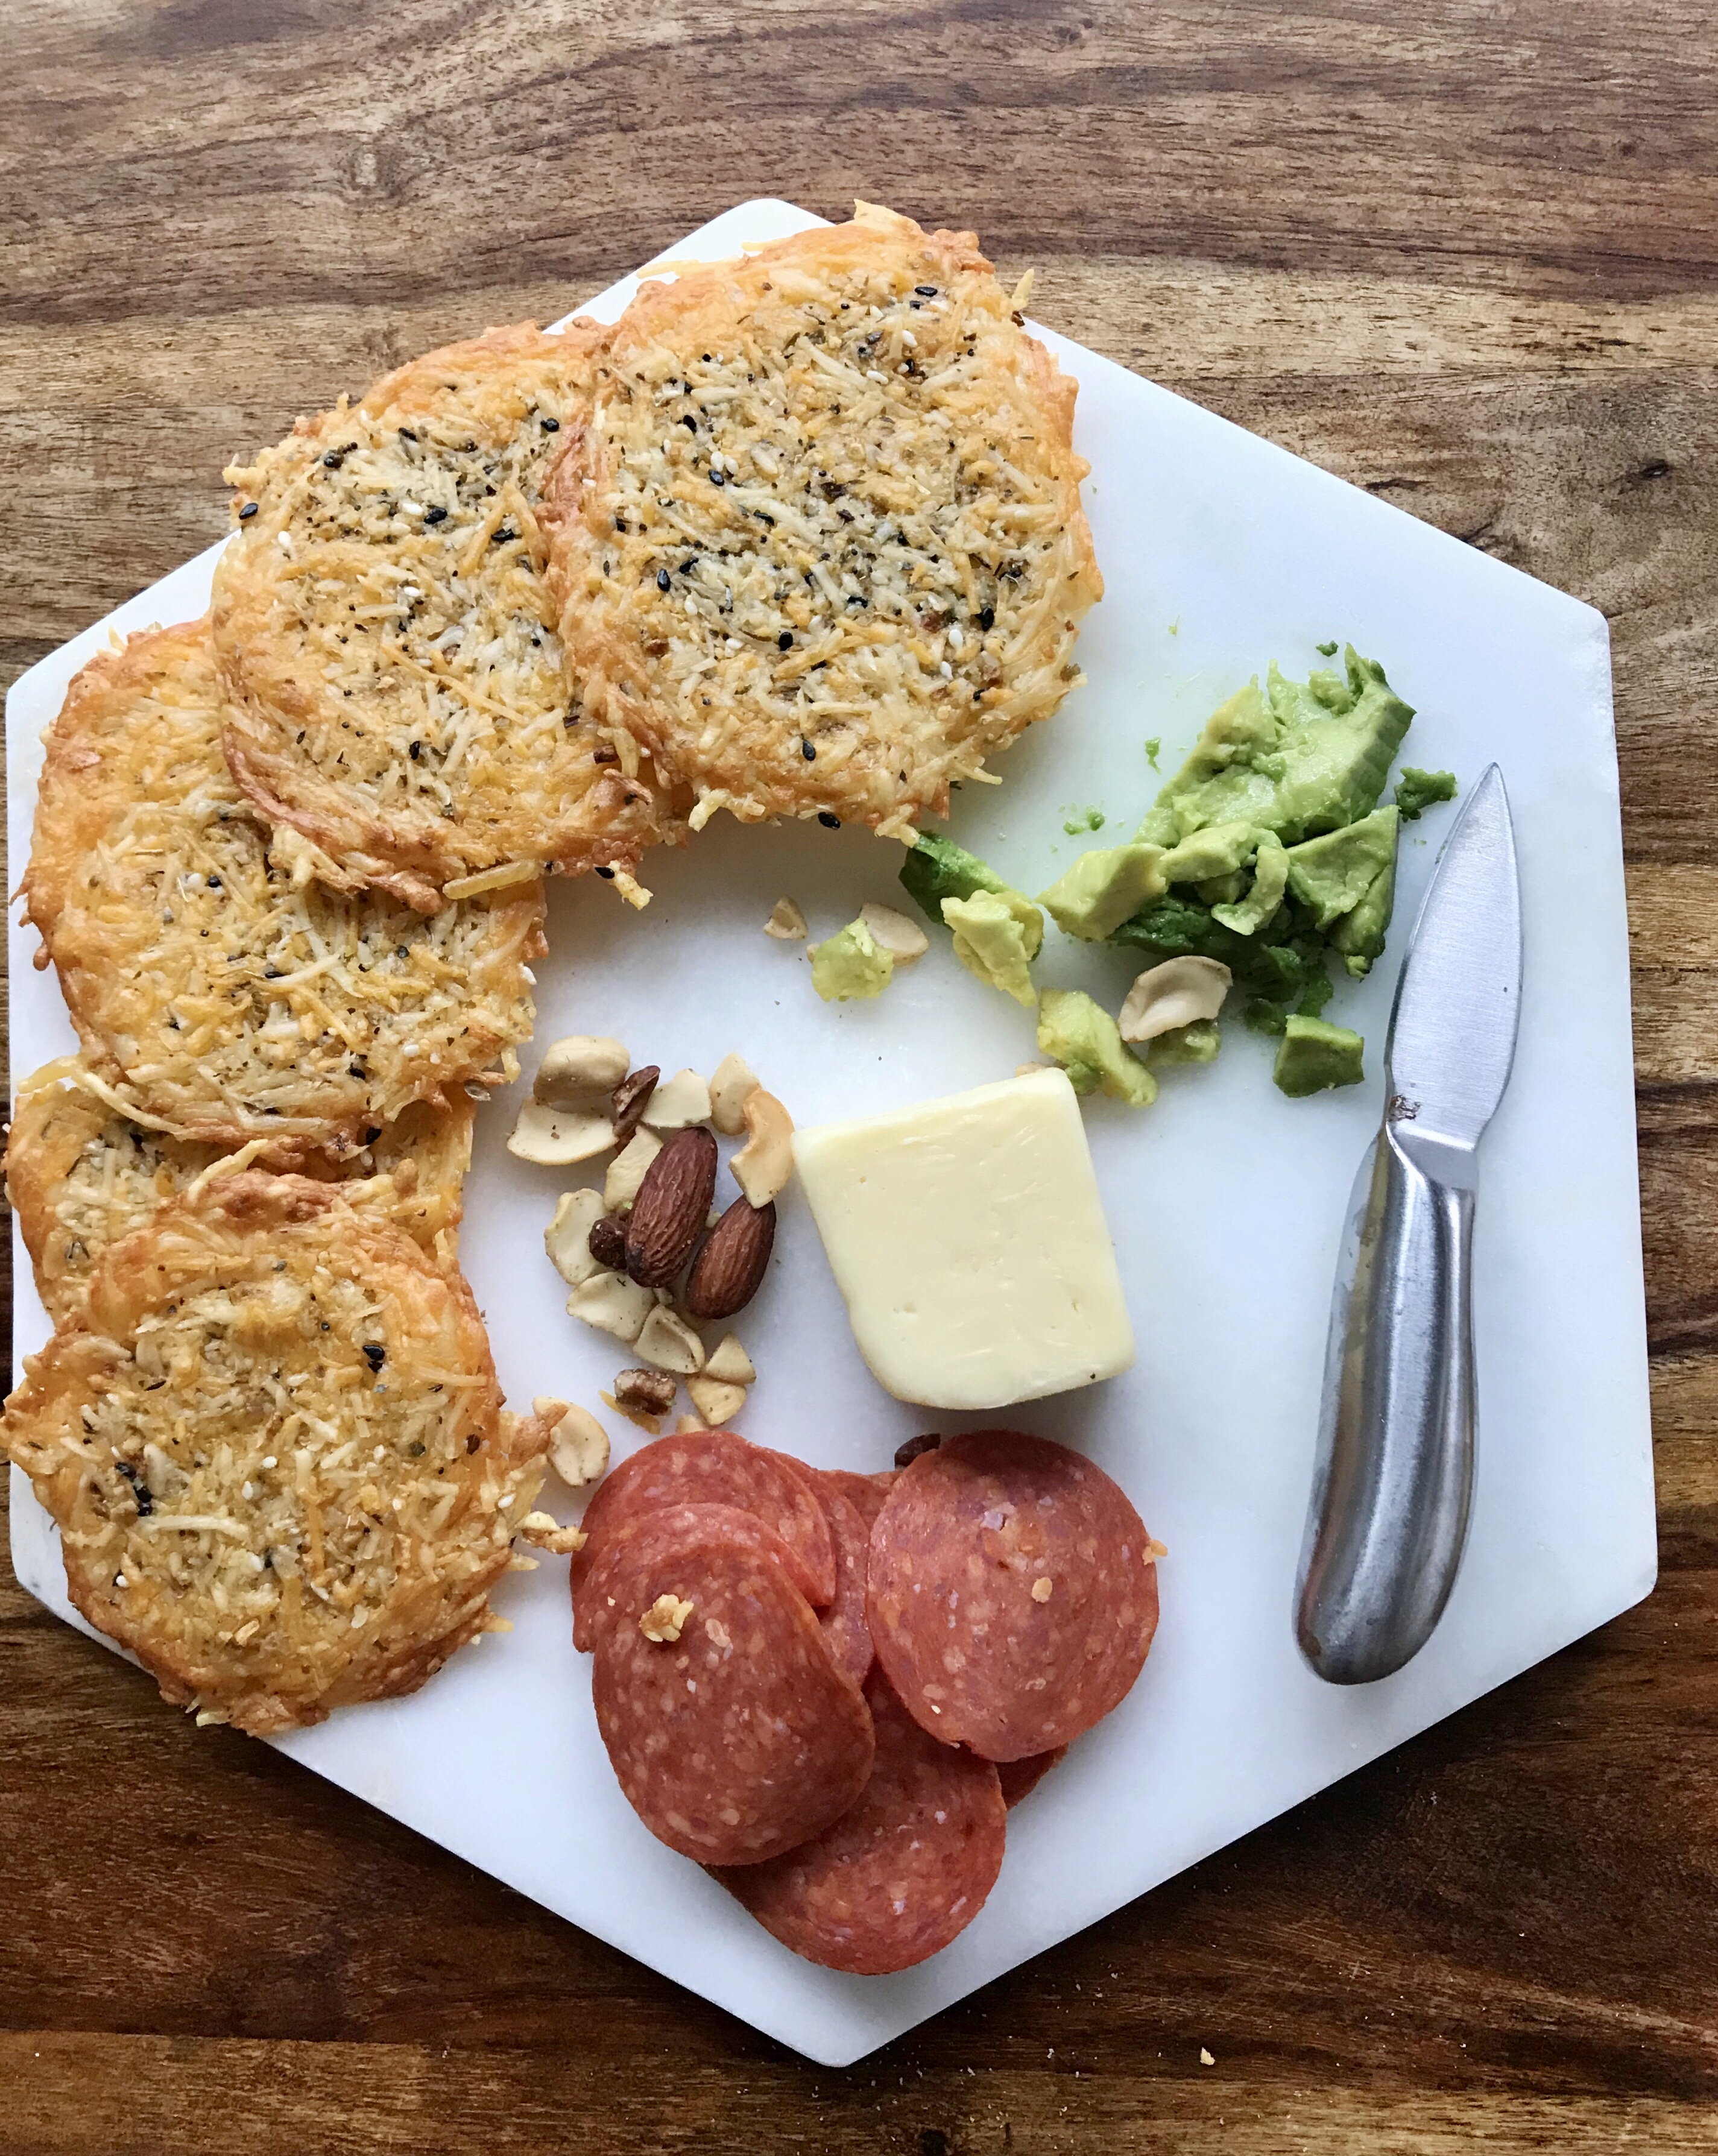 Easy Keto Recipes Using Trader Joe's Everything Bagel Seasoning